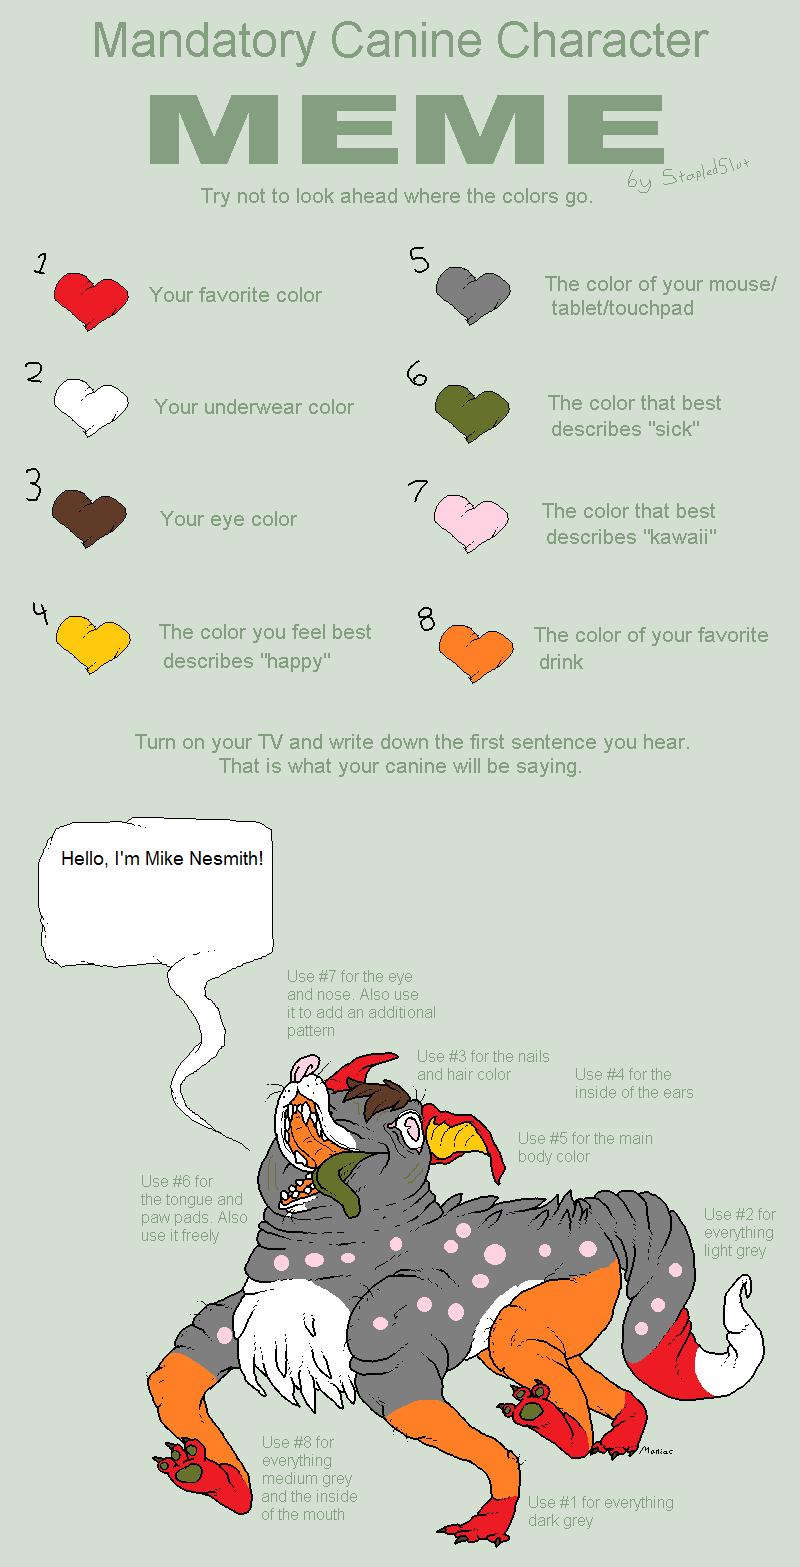 Mandatory Canine Character Meme by Its-Mousepelt